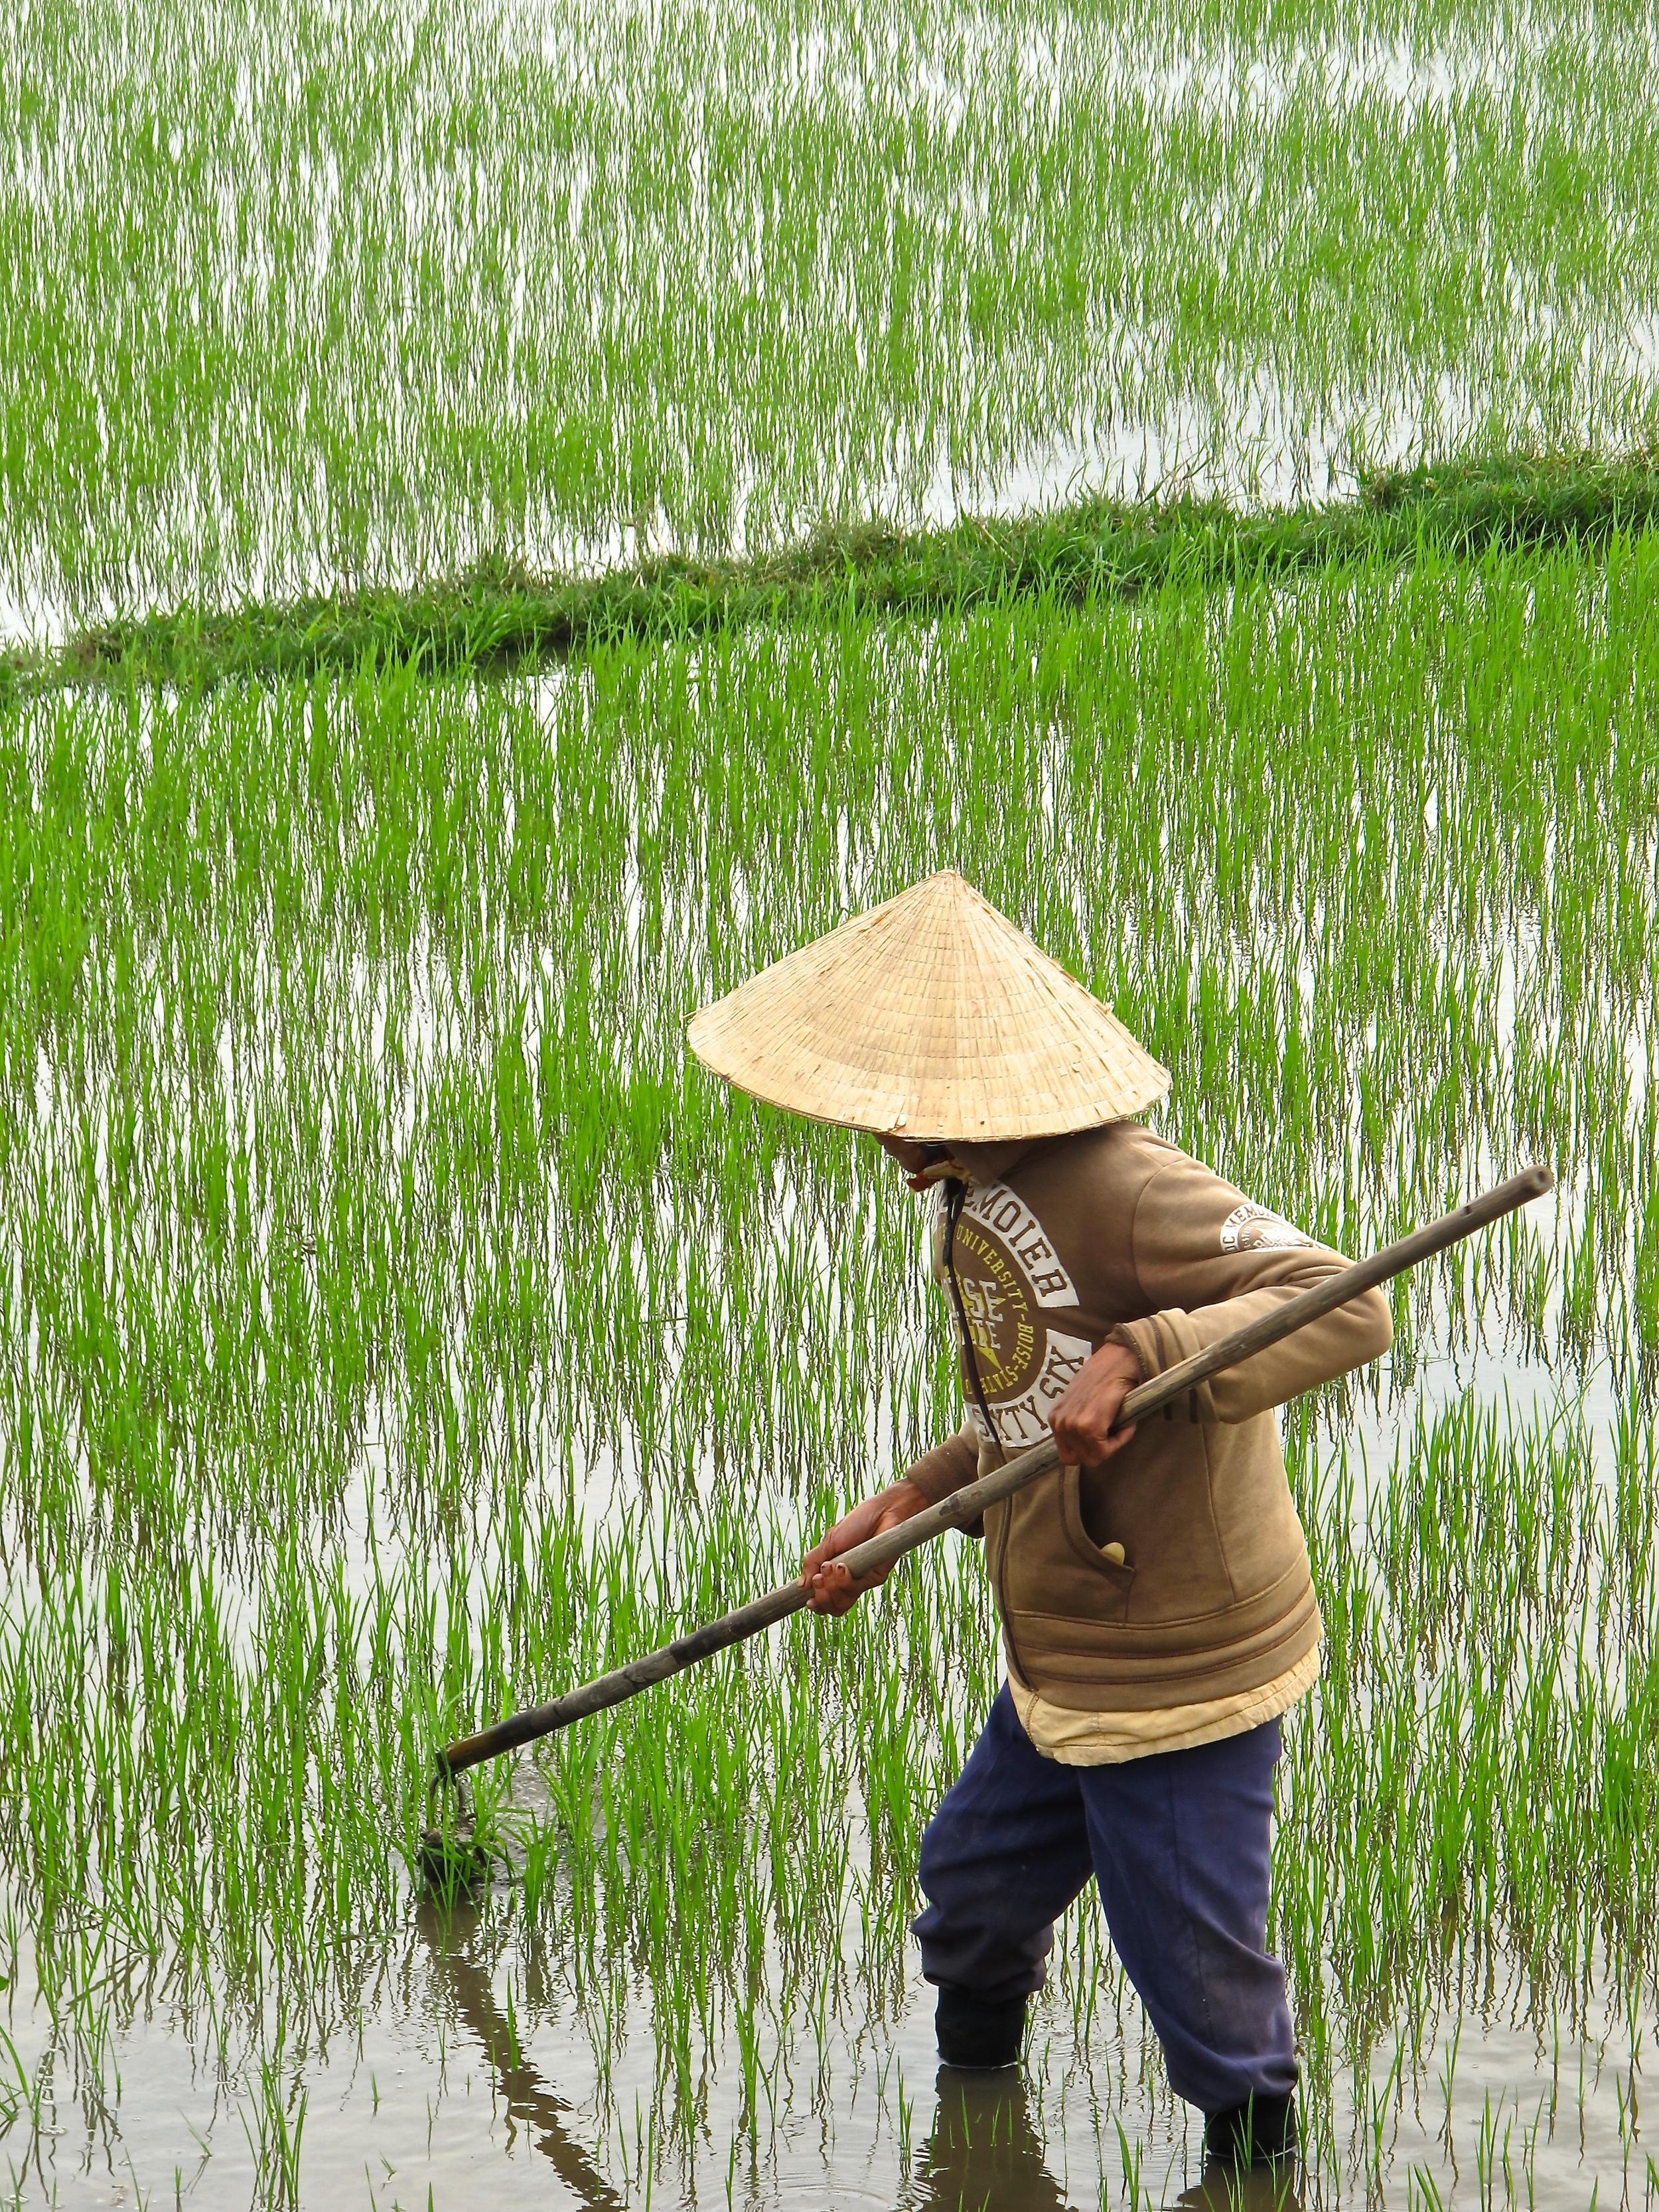 Vietnam rice paddy